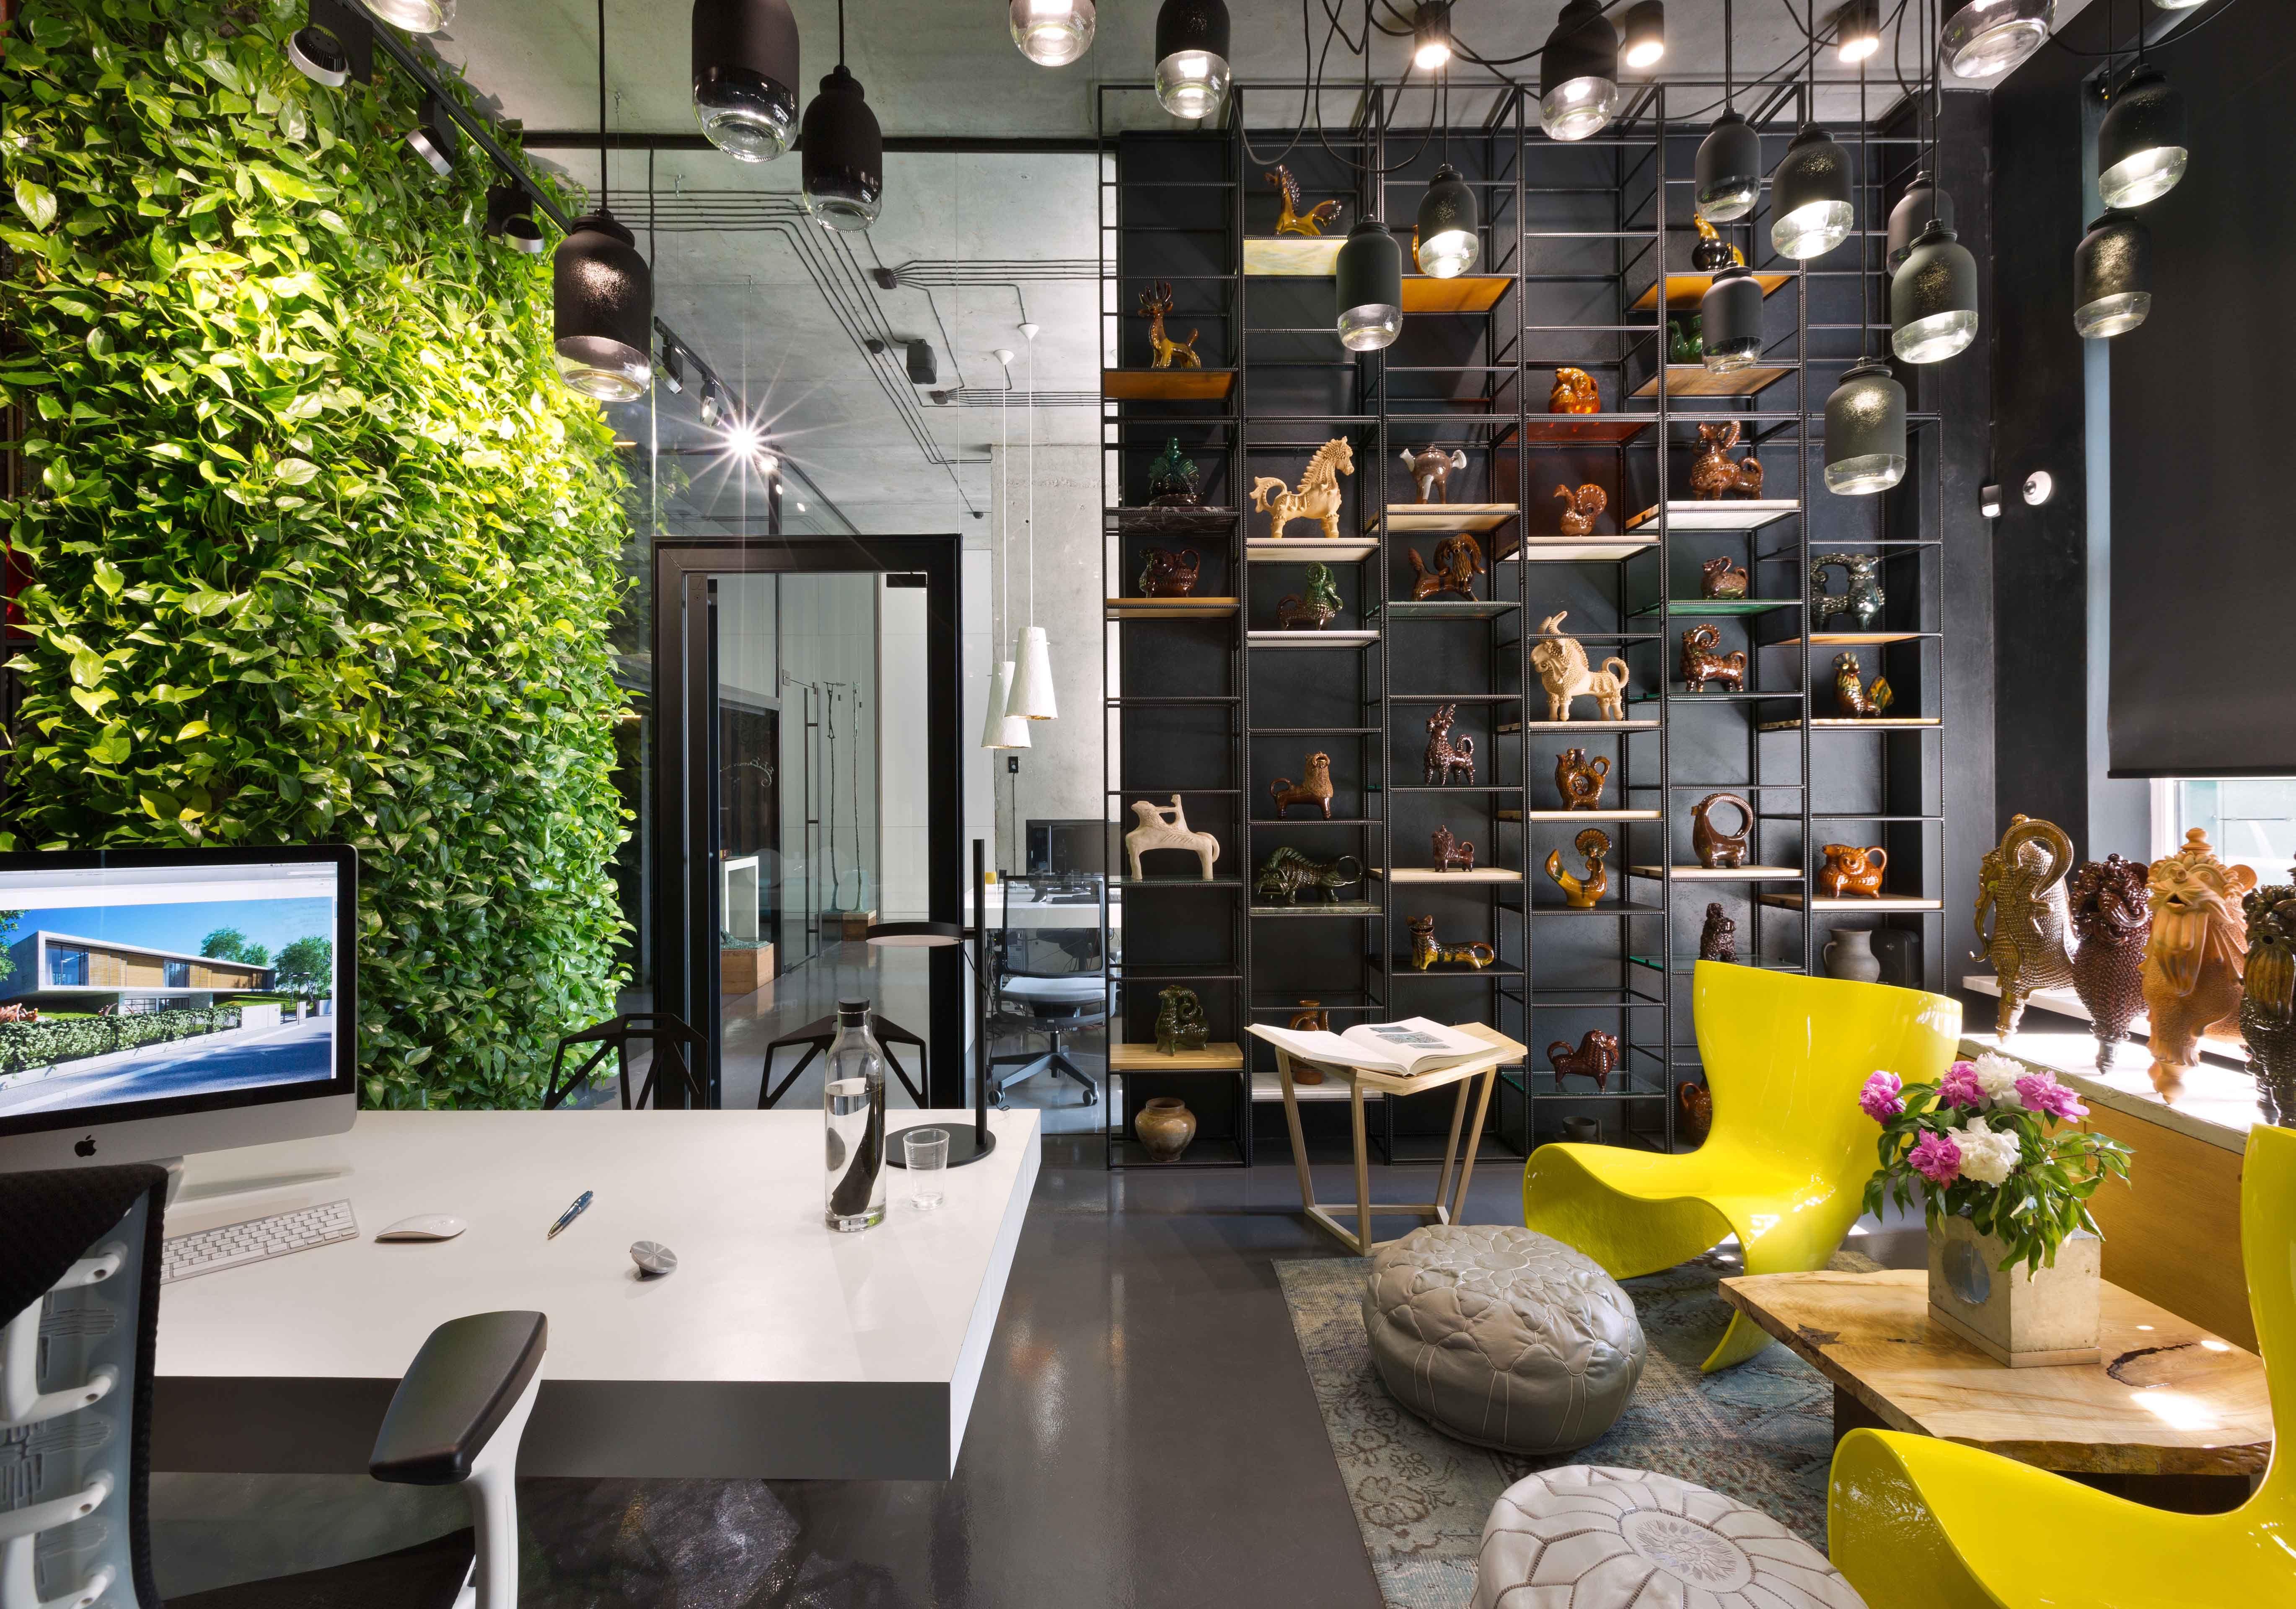 Office & showroom by Sergey Makhno Architect #makhnodesign ...